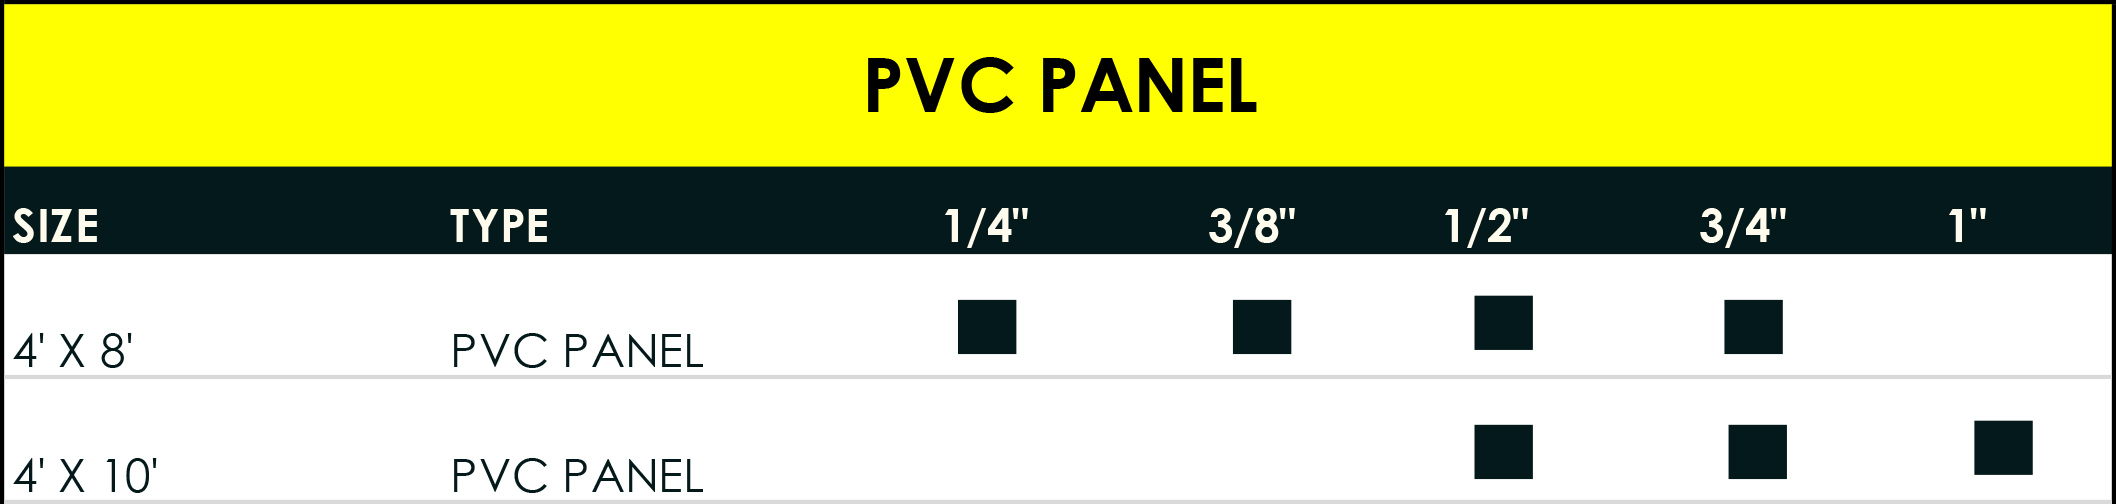 PV PANEL.jpg